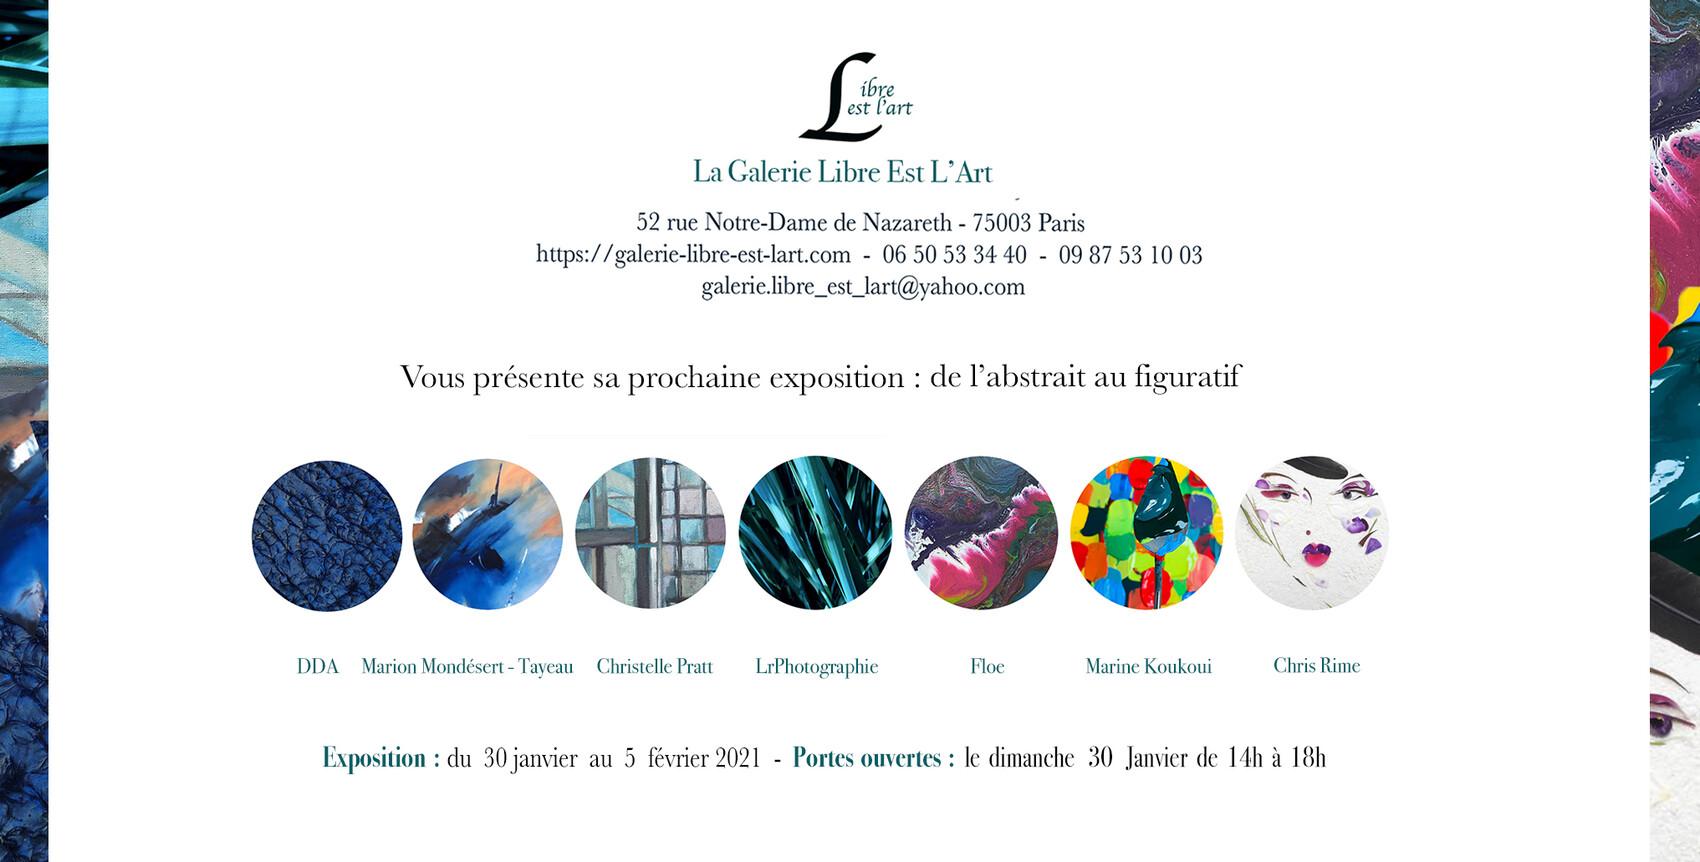 Galerie Libre Est de L'Art